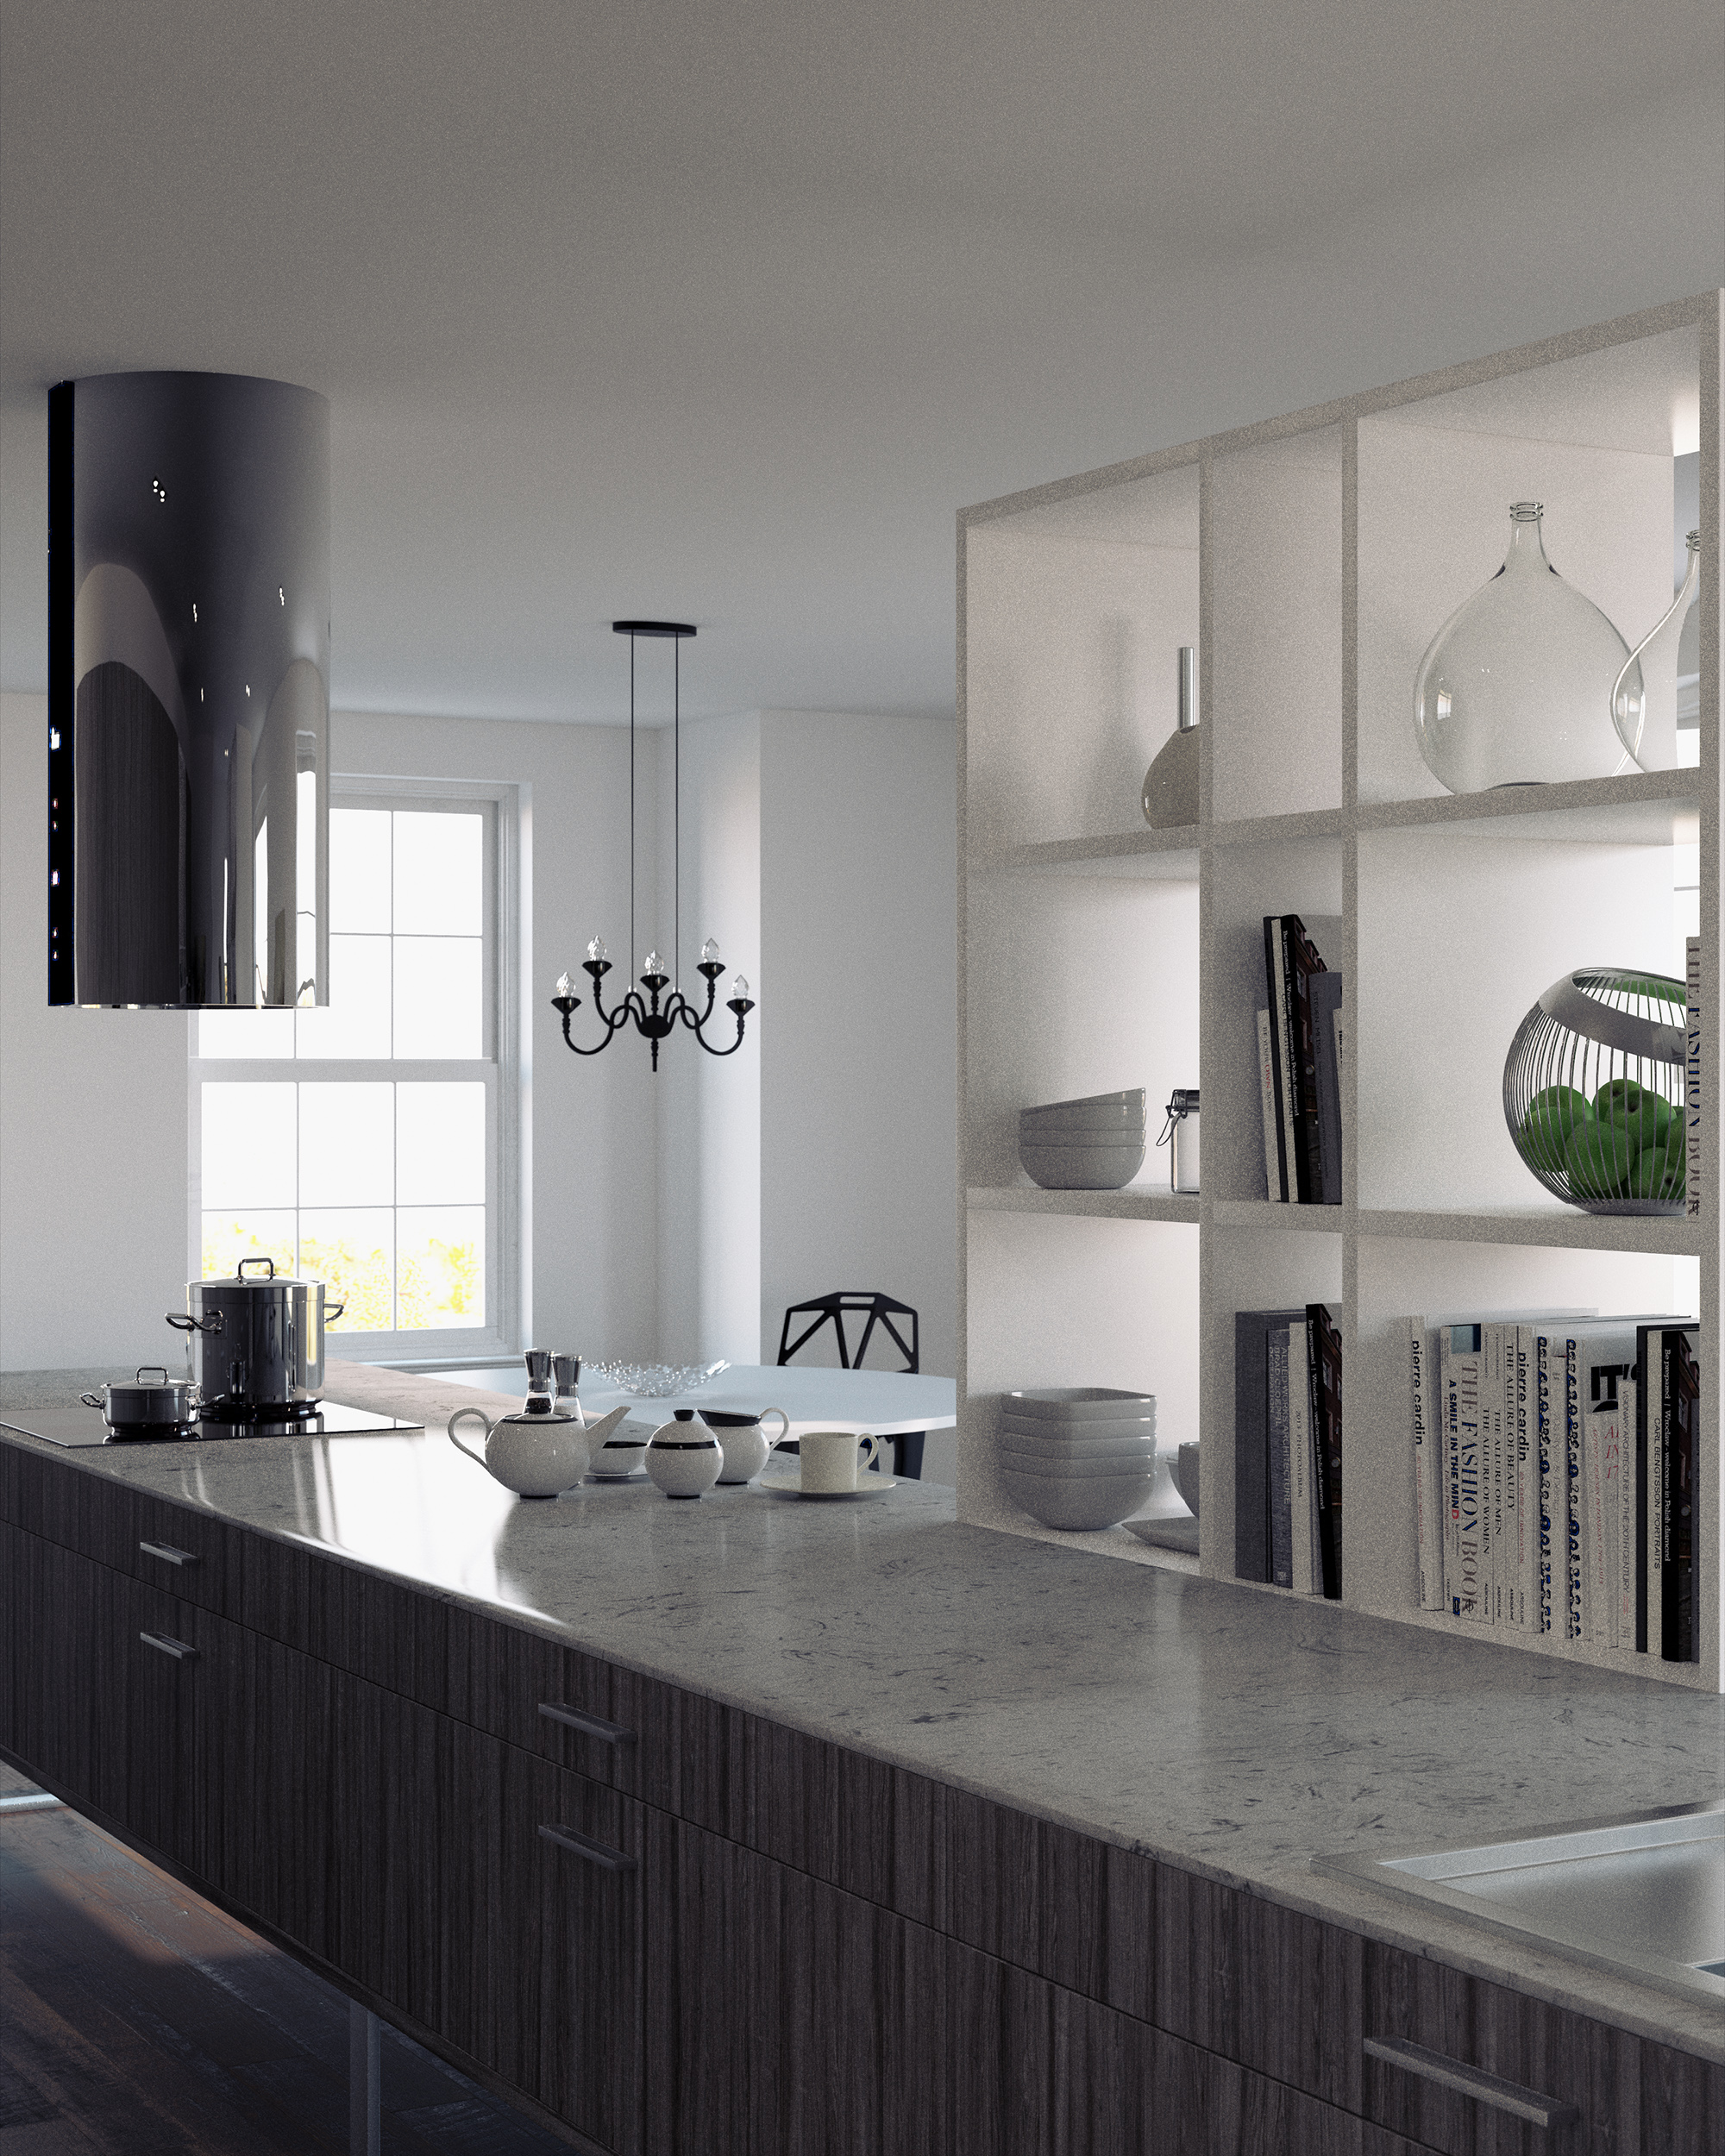 Infografia-ambiente-3d-cocina-Arion_Cam01